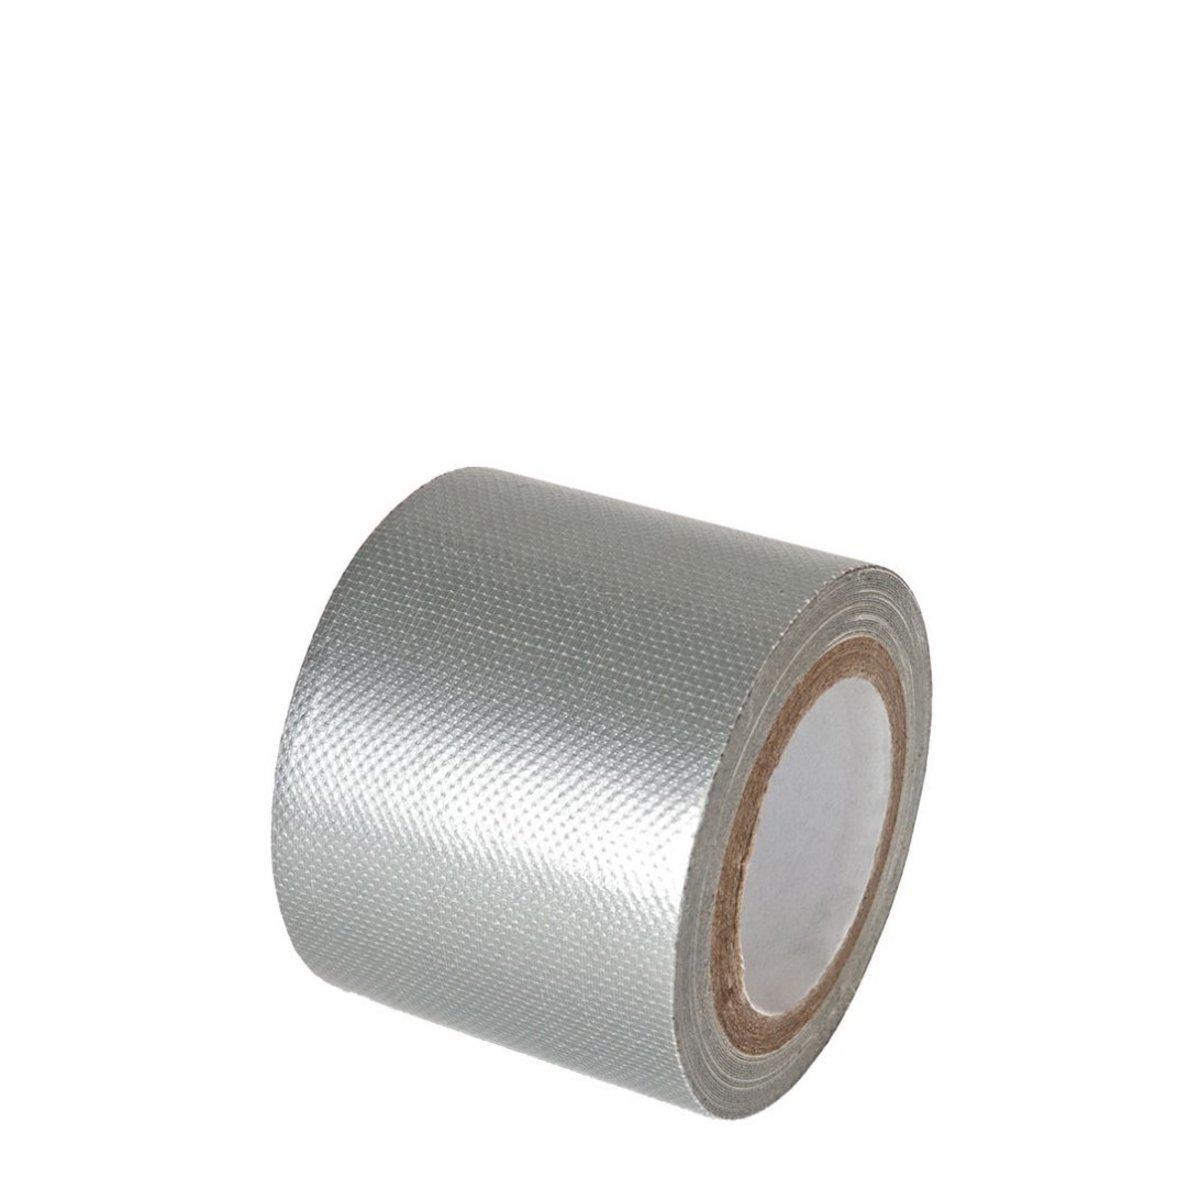 LMV Duct Tape